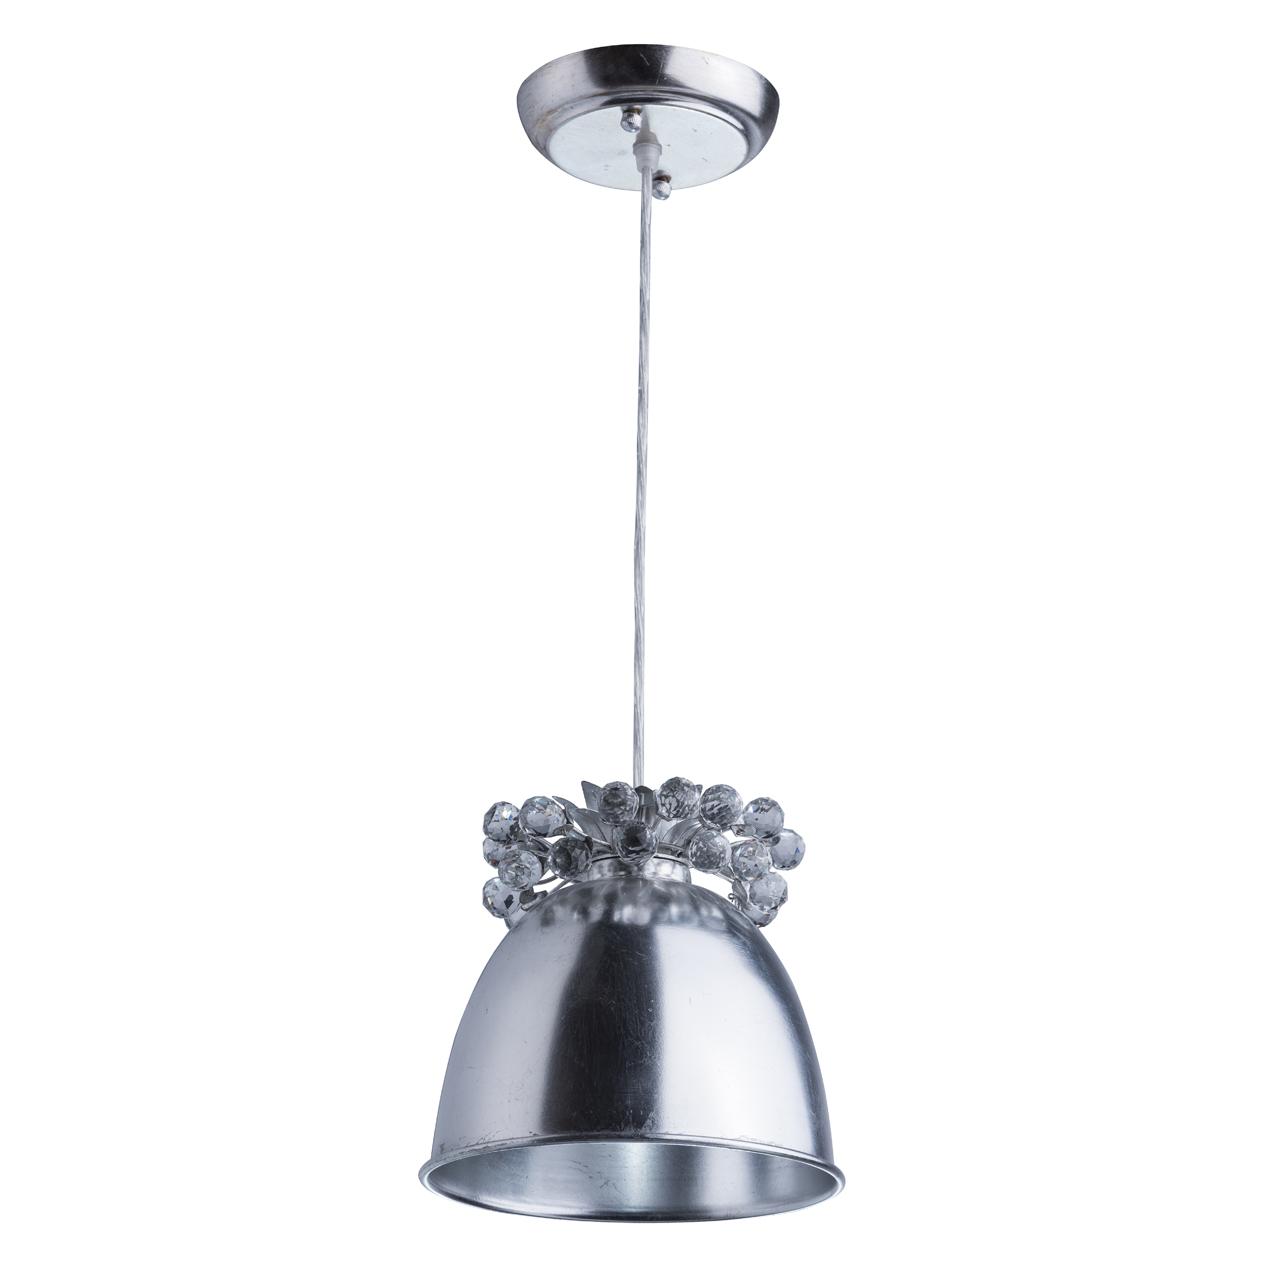 Люстра Chiaro 298011901 Виола подвесной светильник chiaro виола 298011901